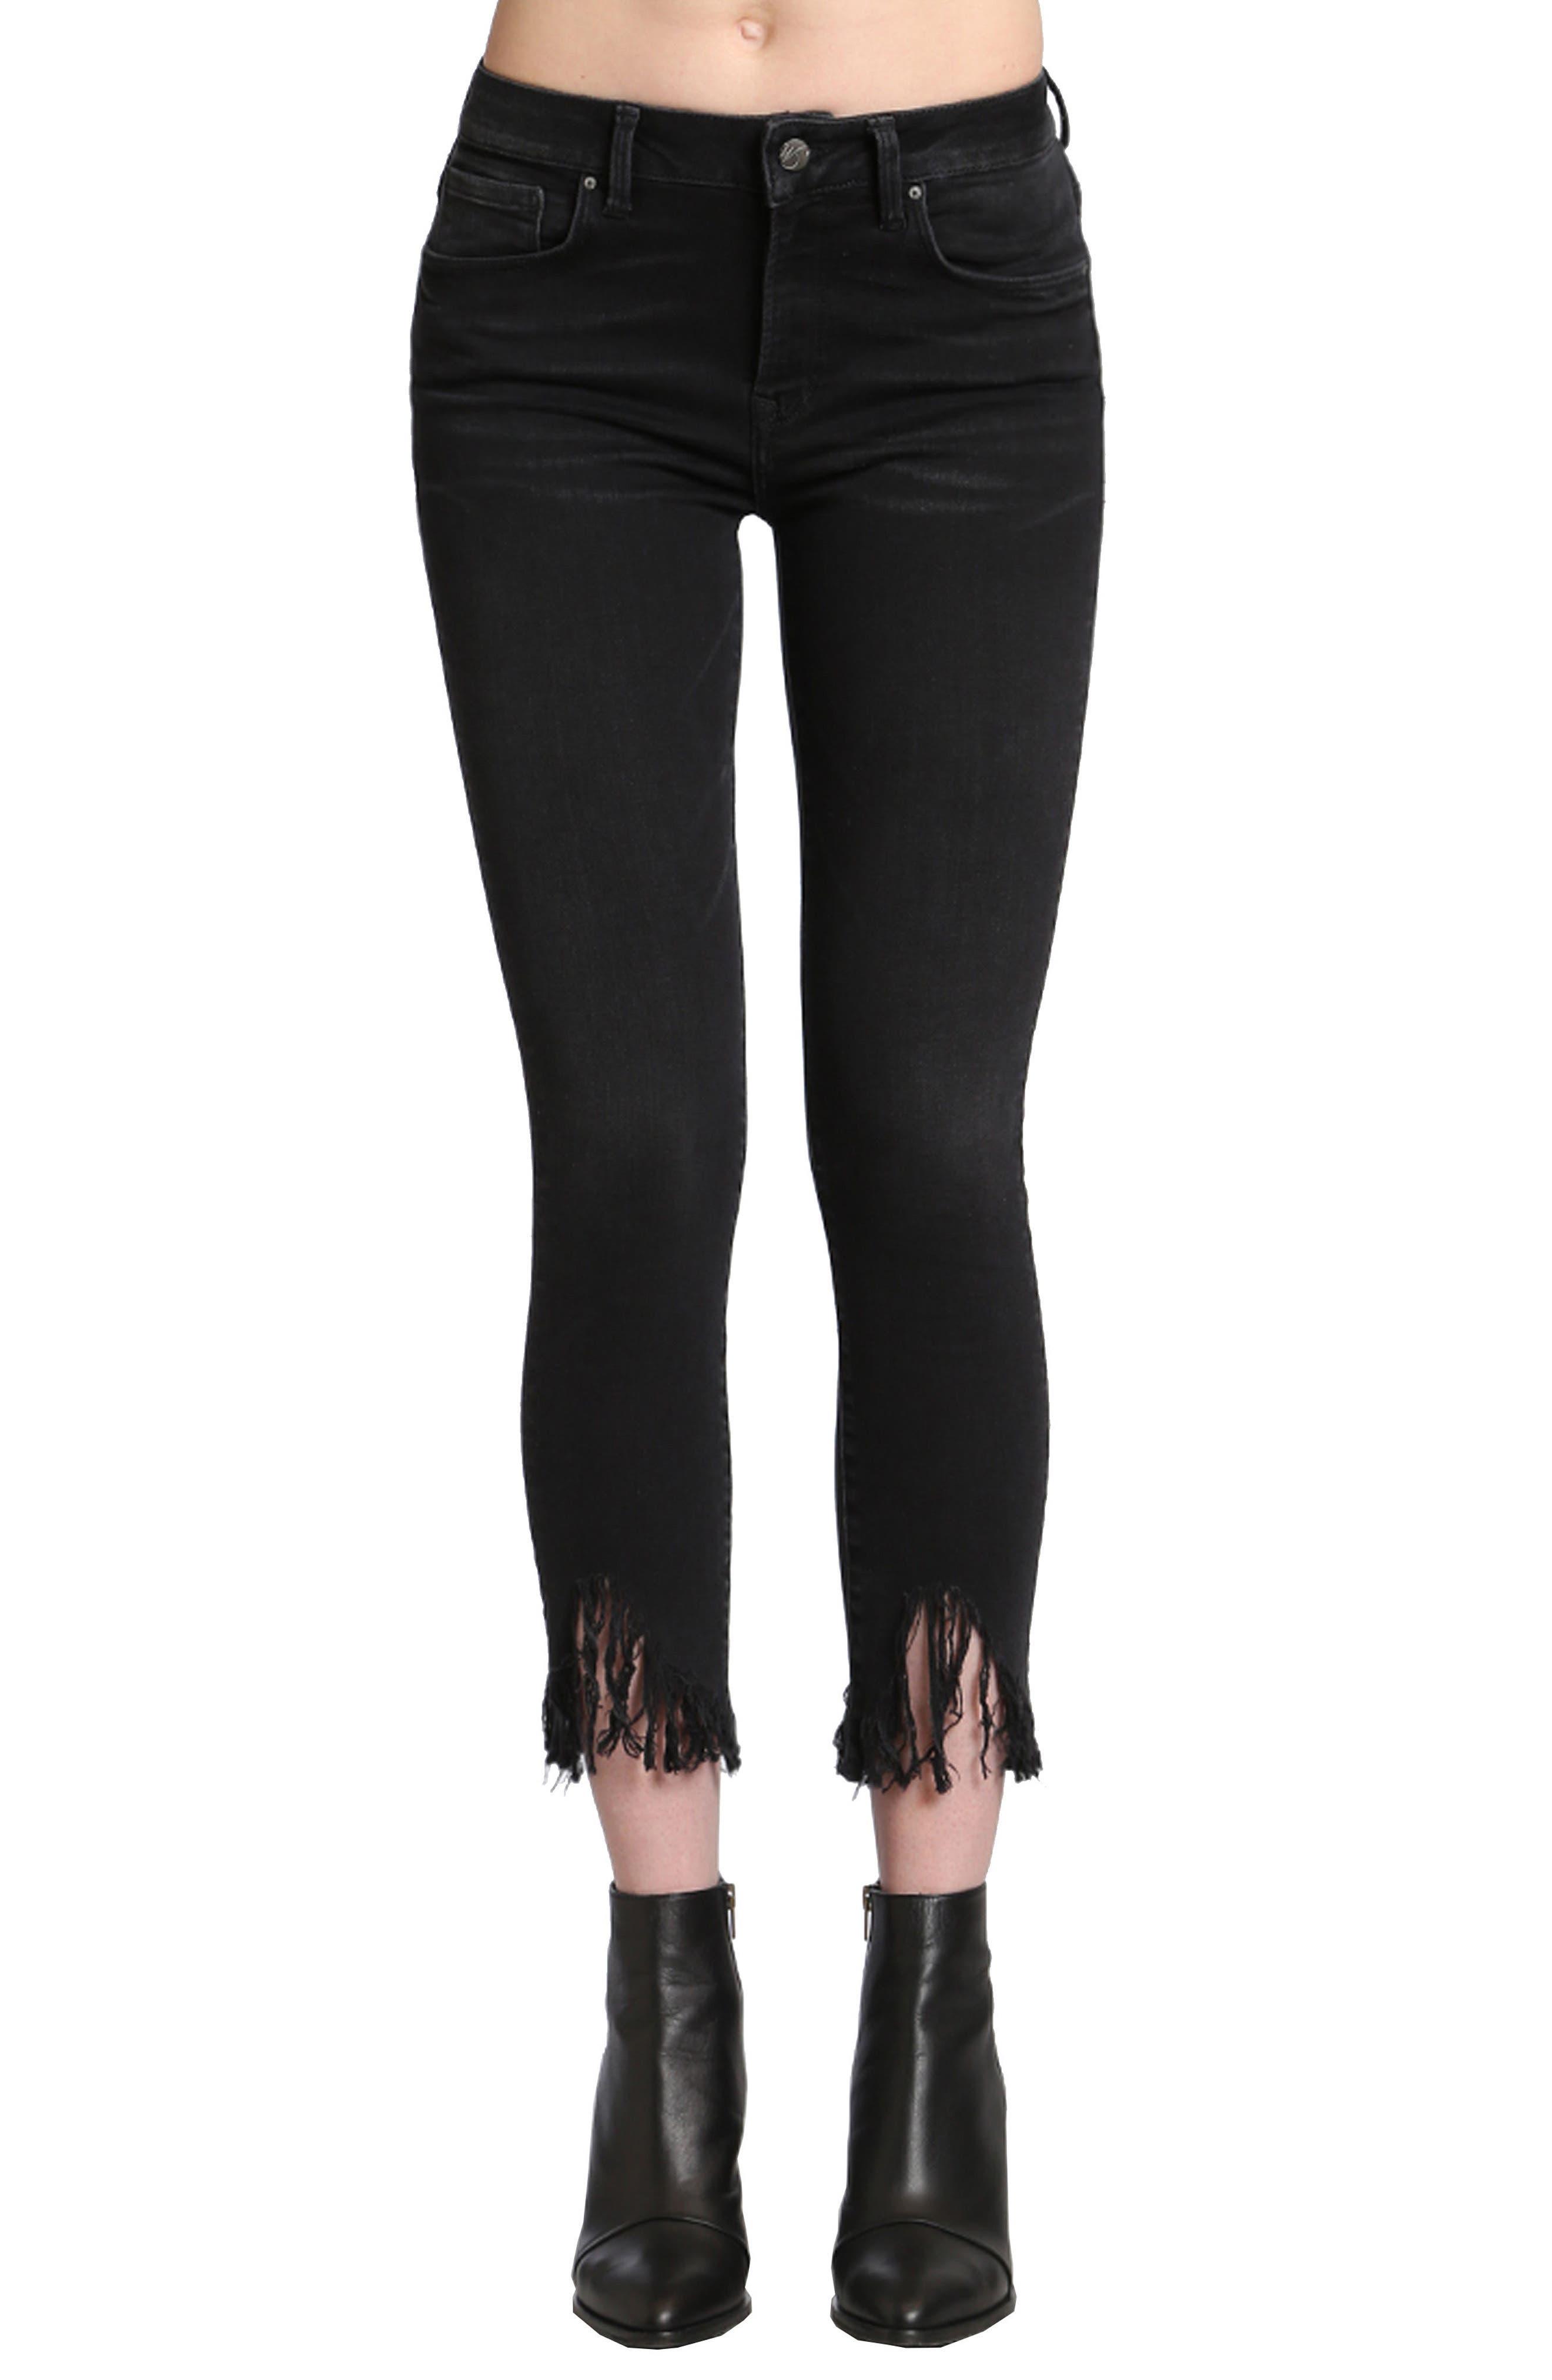 Main Image - Mavi Jeans Tess Fringe Skinny Crop Jeans (Smoke)